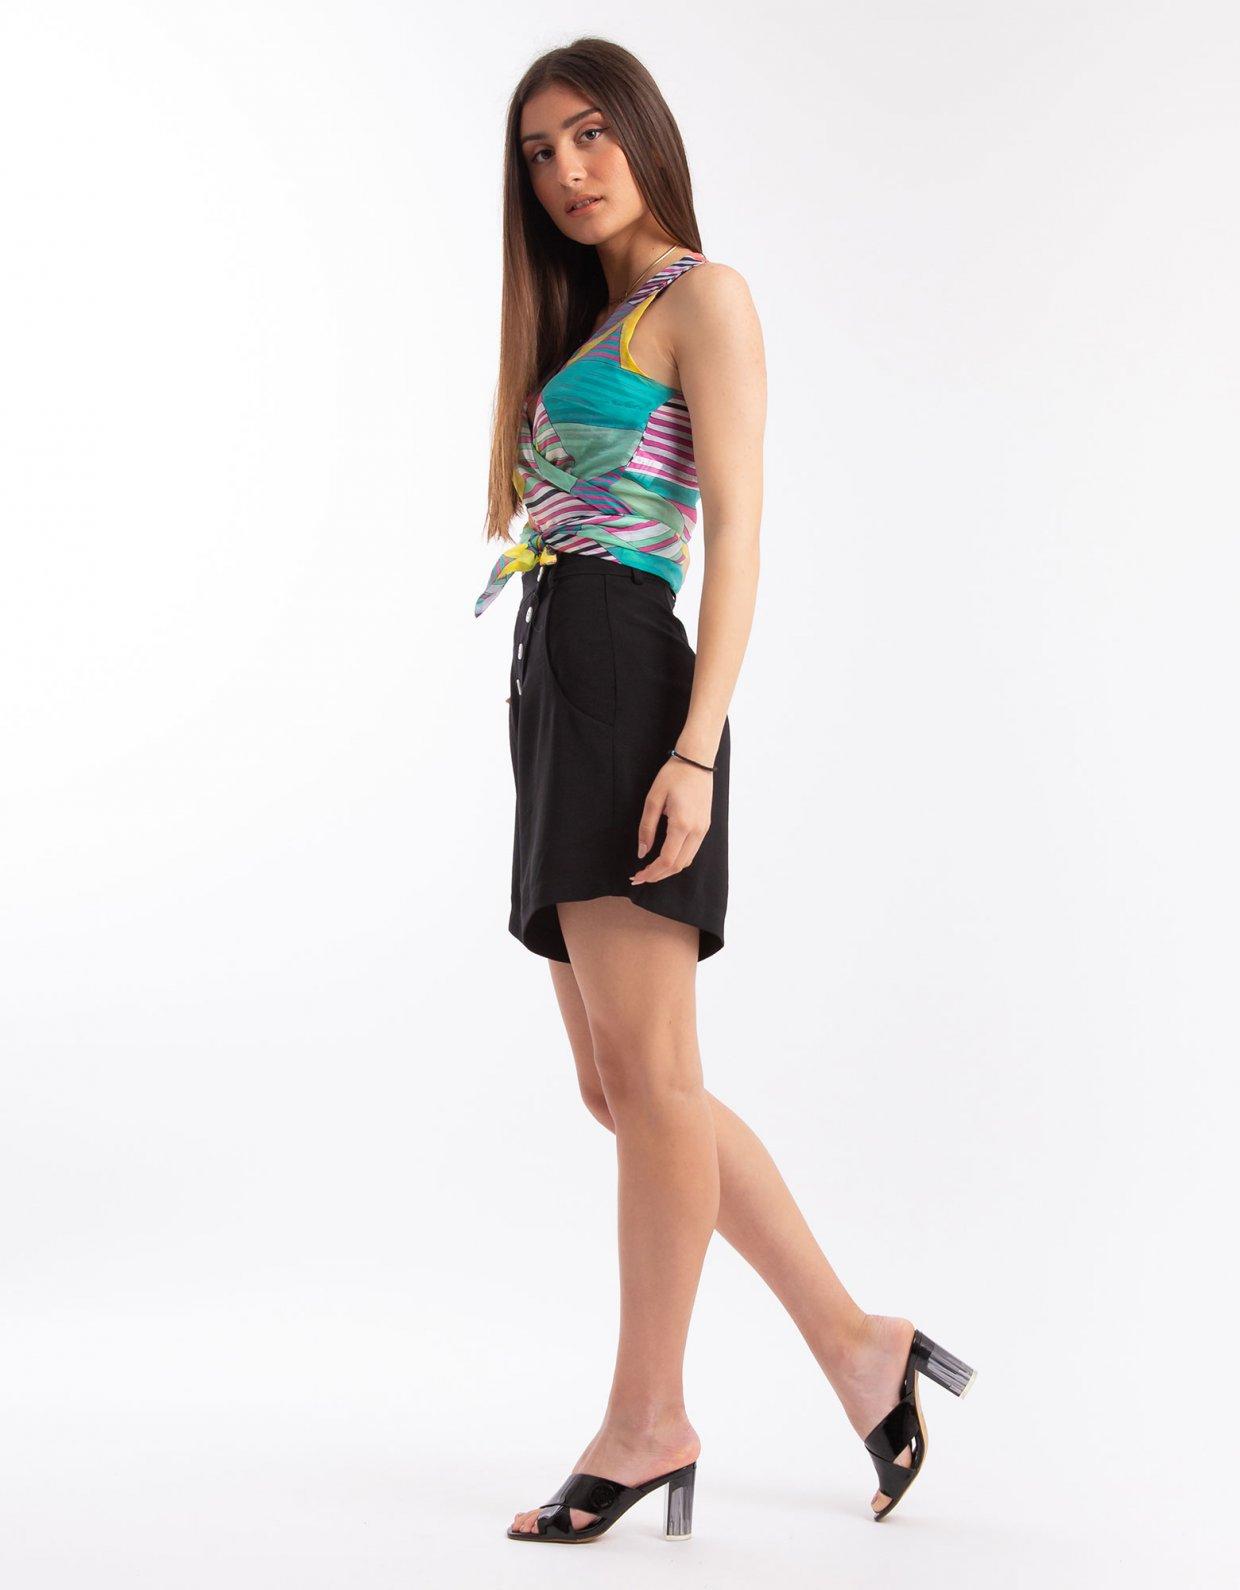 Nadia Rapti Shades of Sahara black shorts